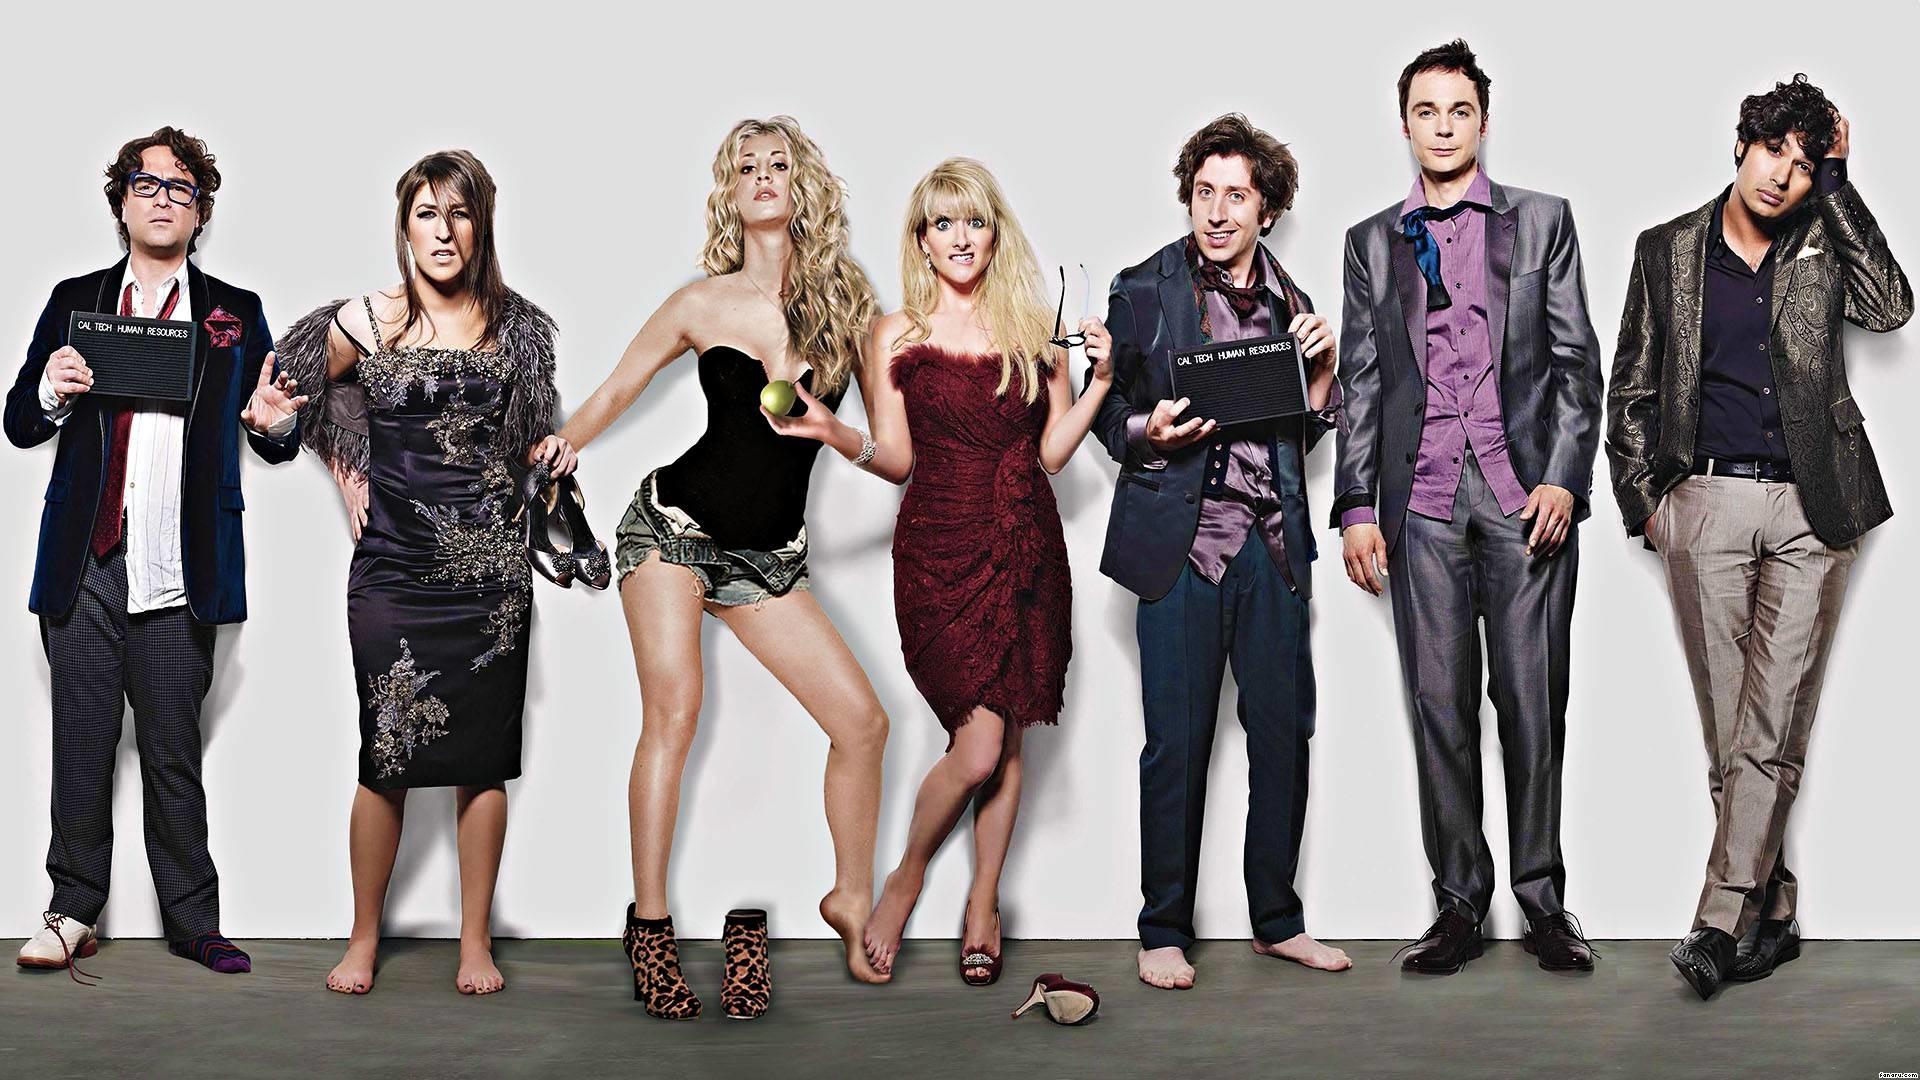 Home Comedy The Big Bang Theory S8 E23